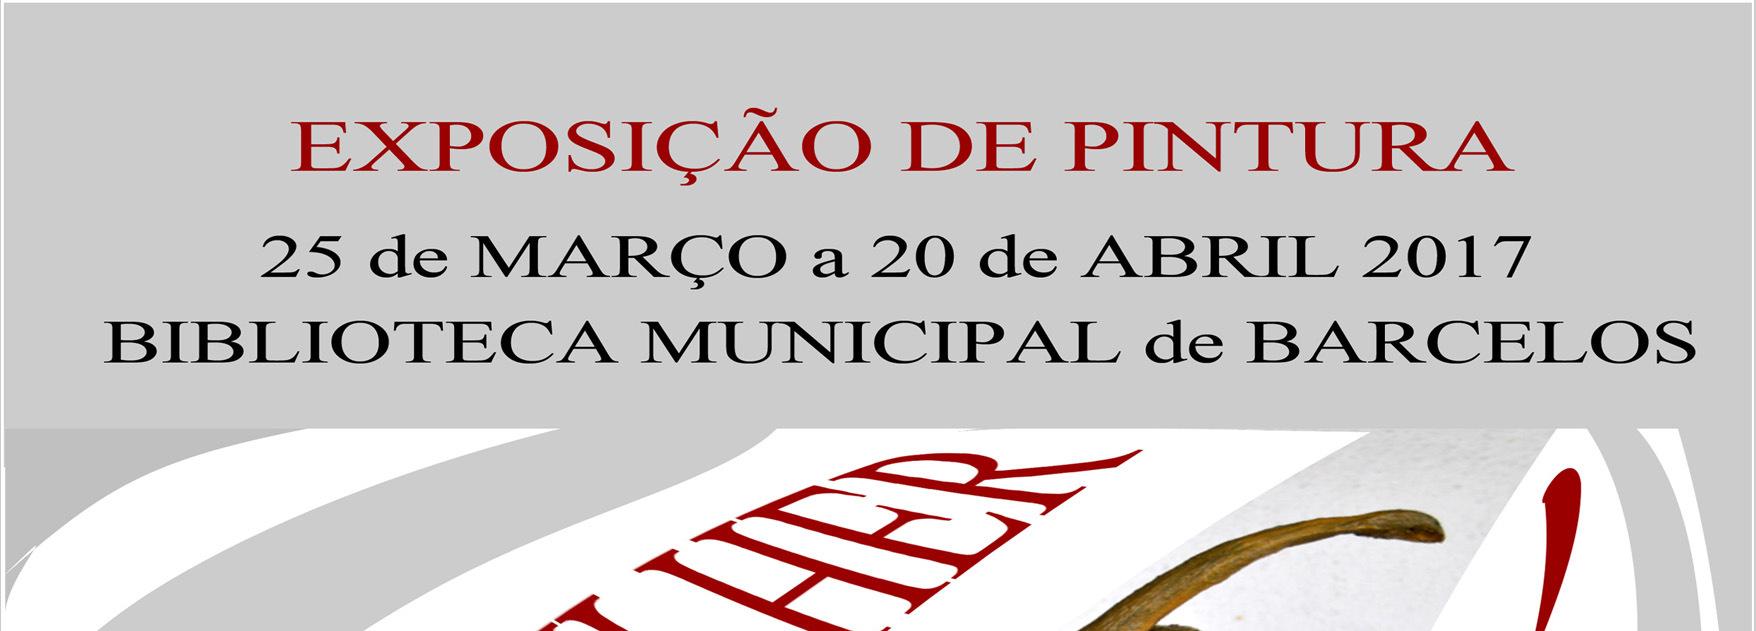 """SER MULHER"" NA BIBLIOTECA MUNICIPAL DE BARCELOS"